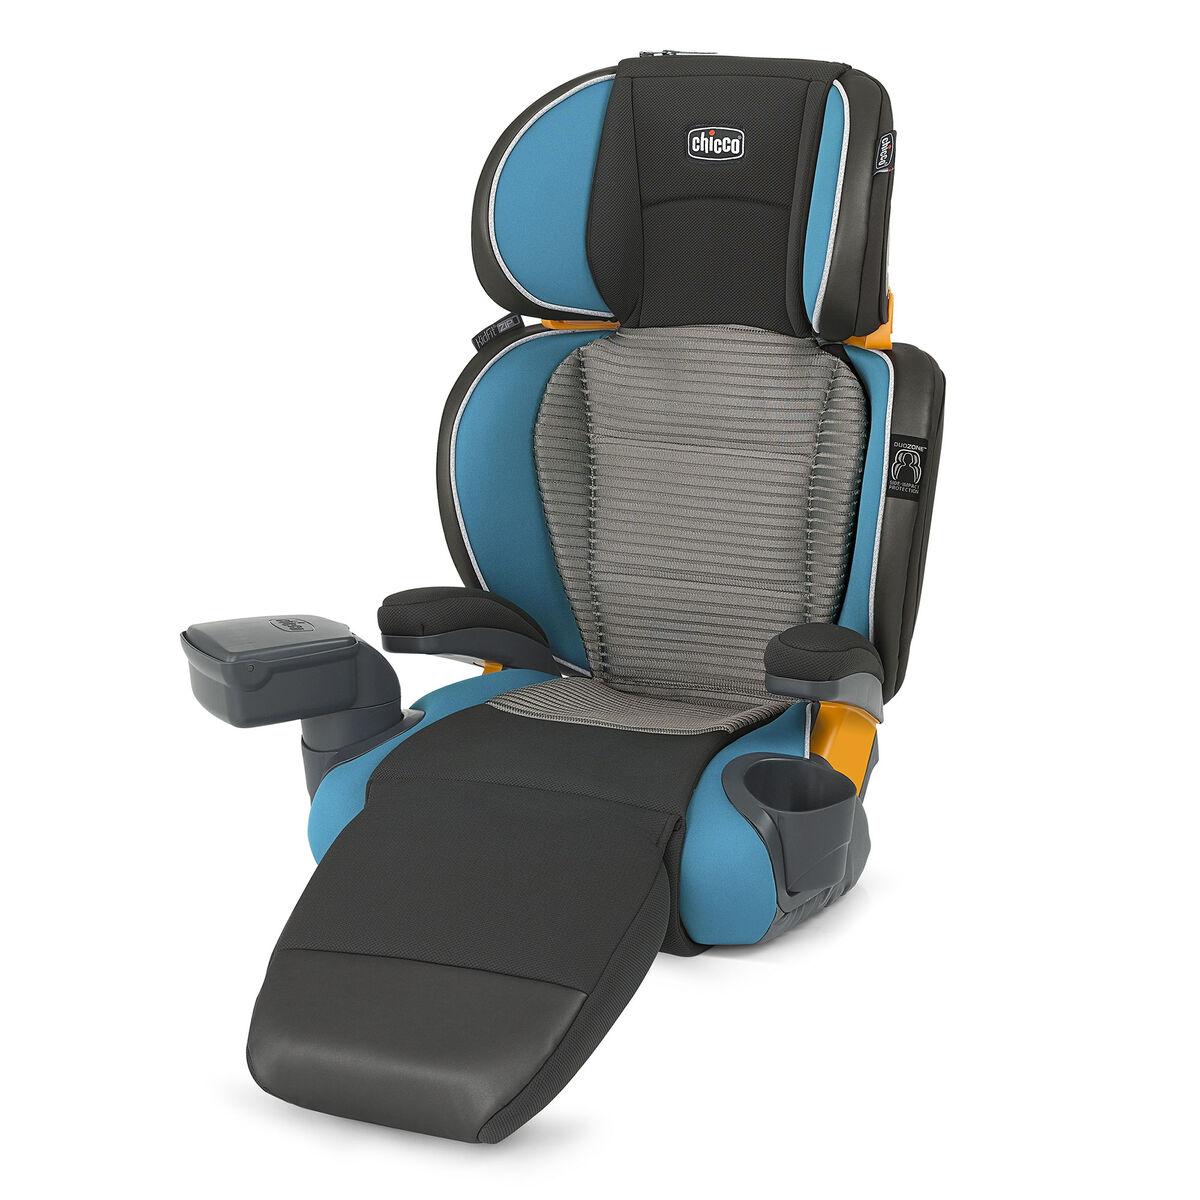 chicco kidfit zip air  ventata - kidfit zip air in belt positioning booster car seat  ventatakidfit zipair in belt positioning booster car seat  ventata